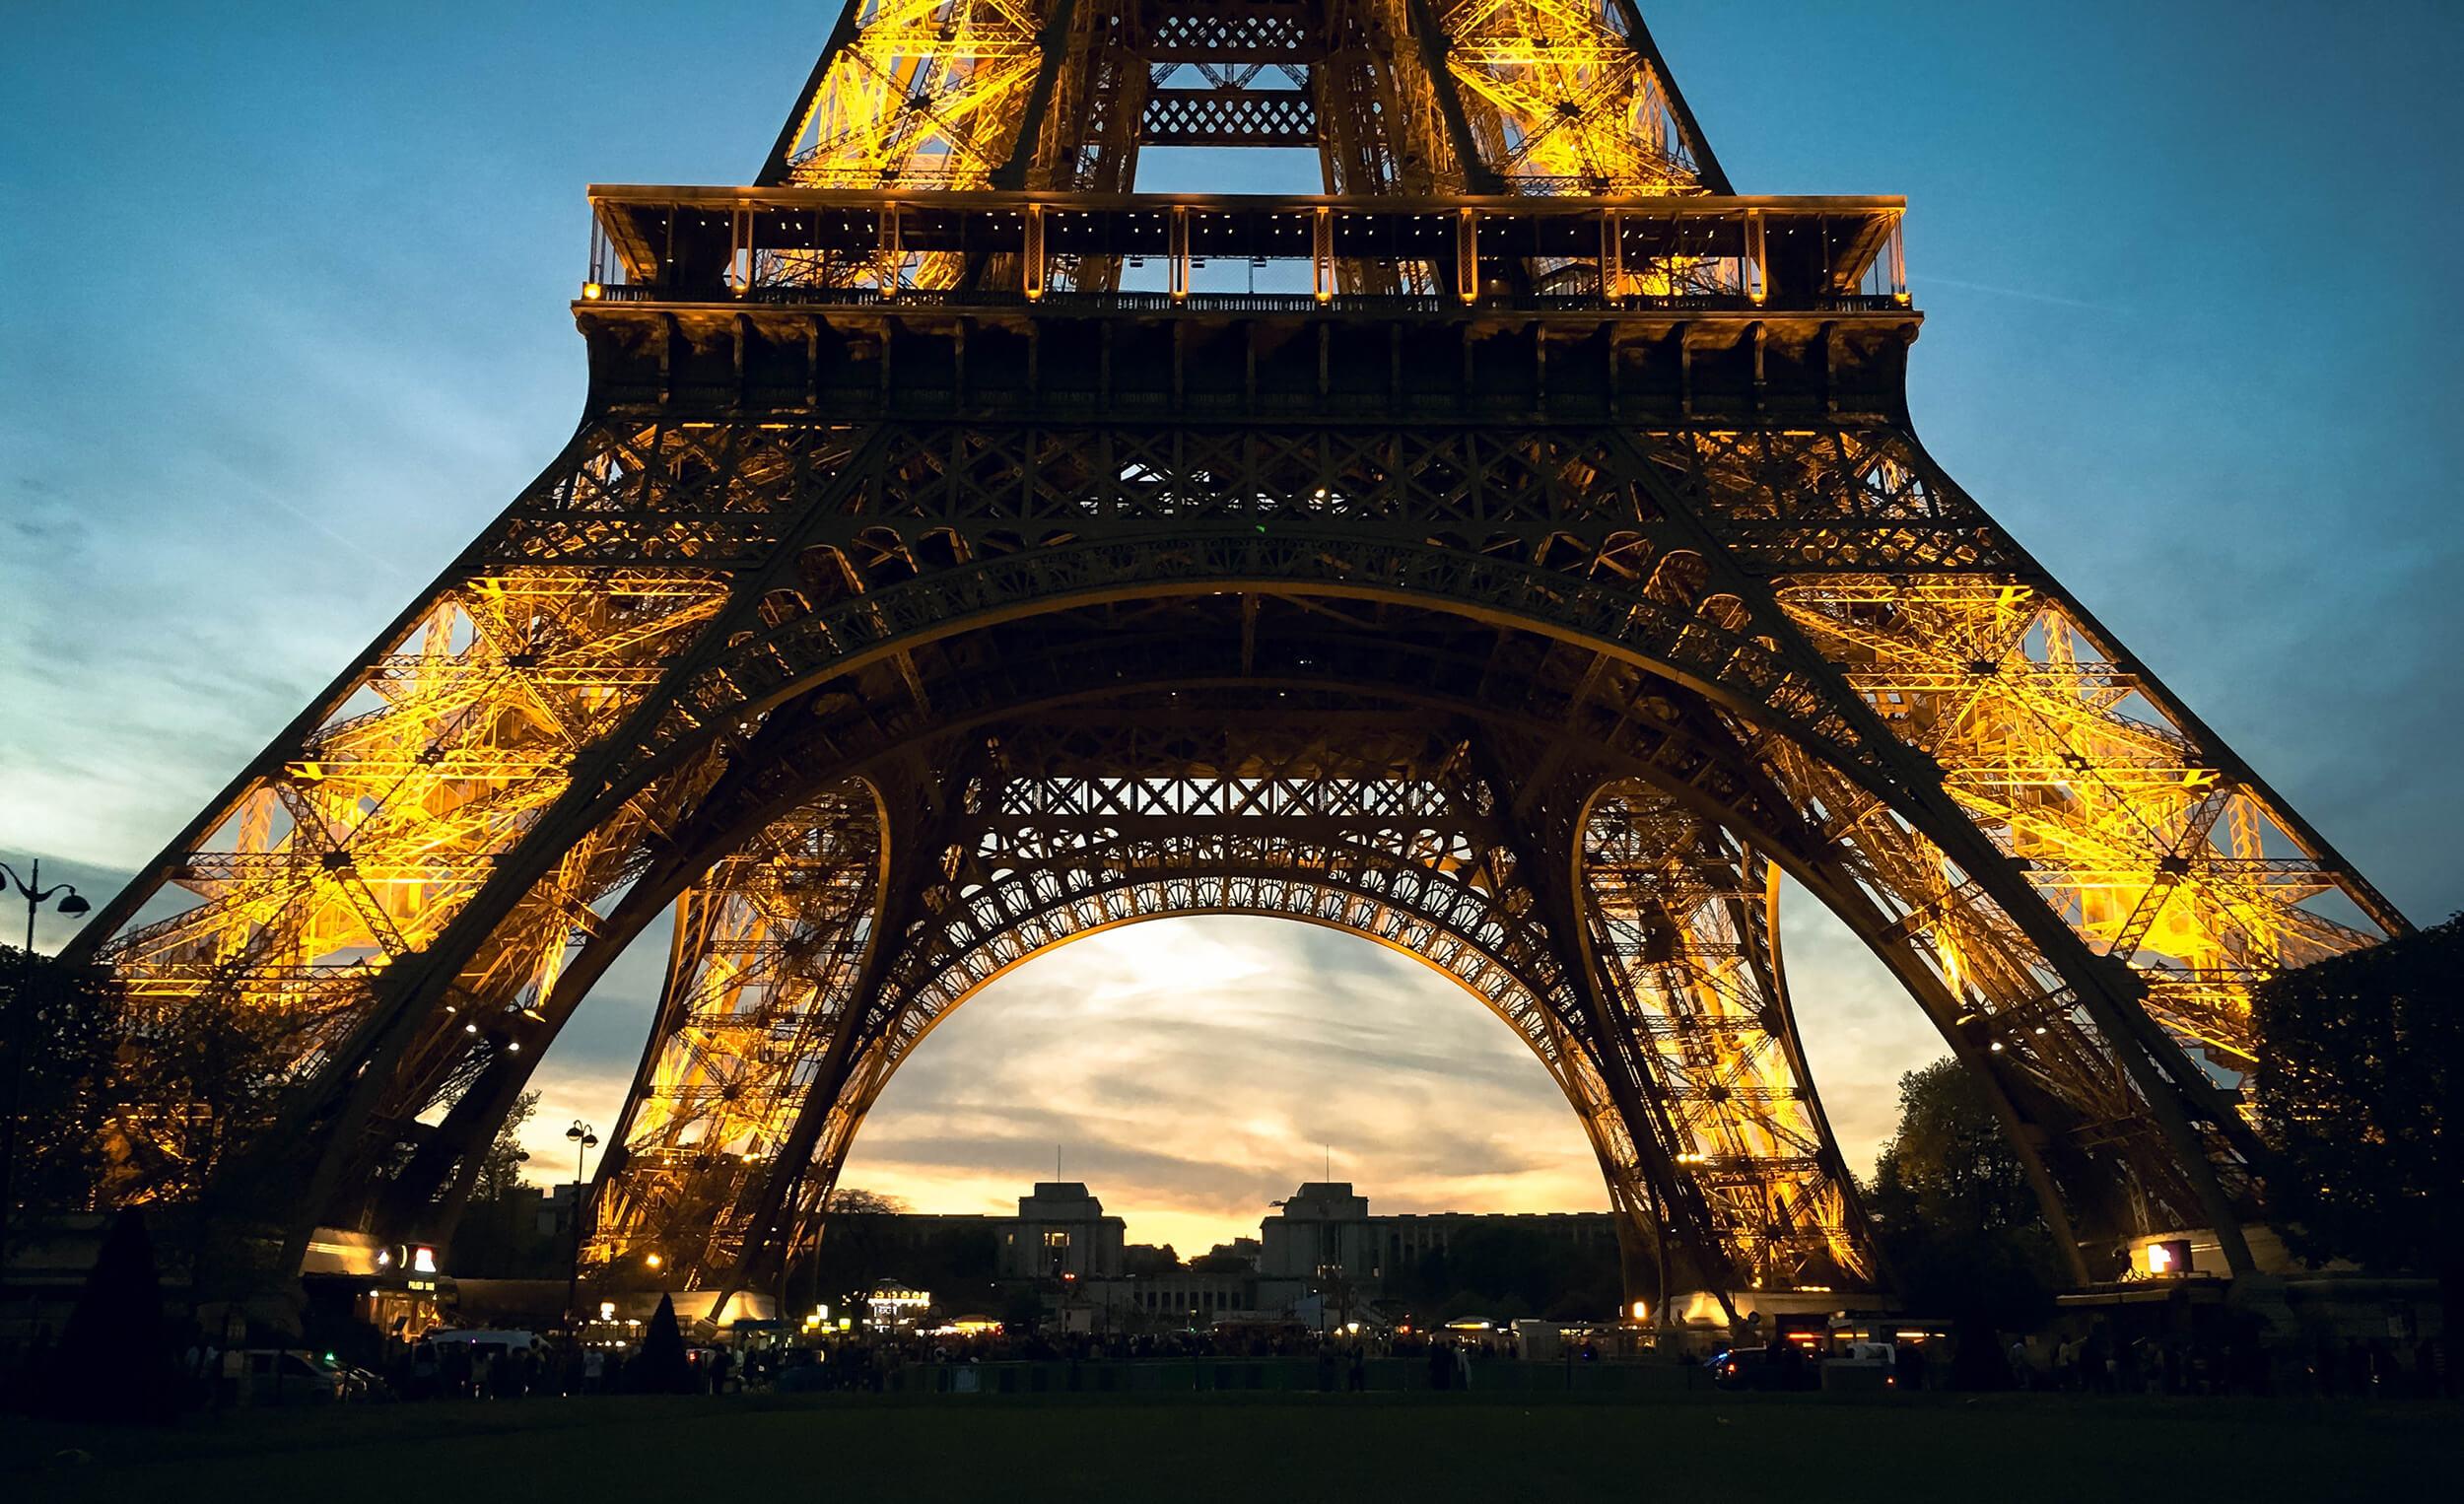 France 2016 – Landmarks & Architecture